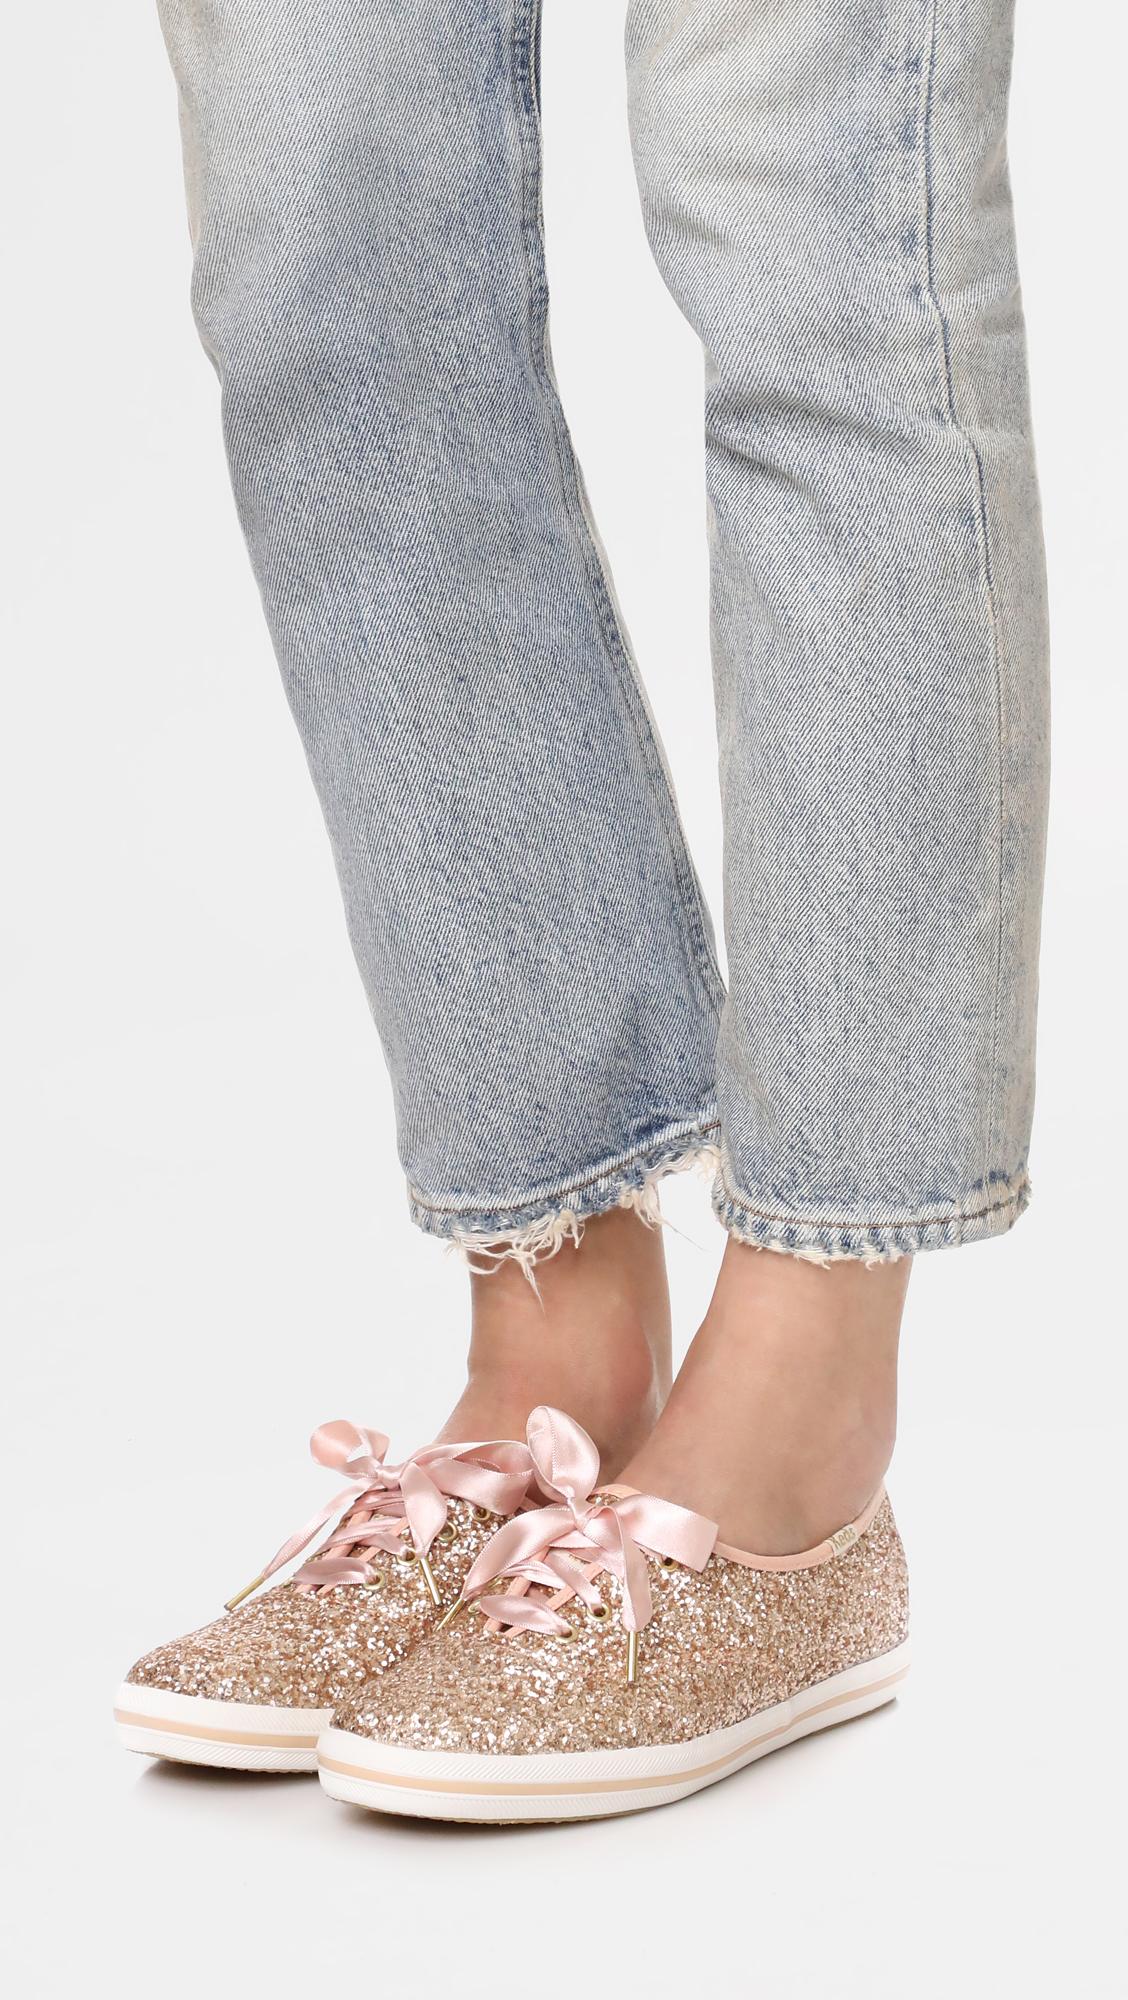 cc03c8252a3 Keds x Kate Spade New York Glitter Sneakers